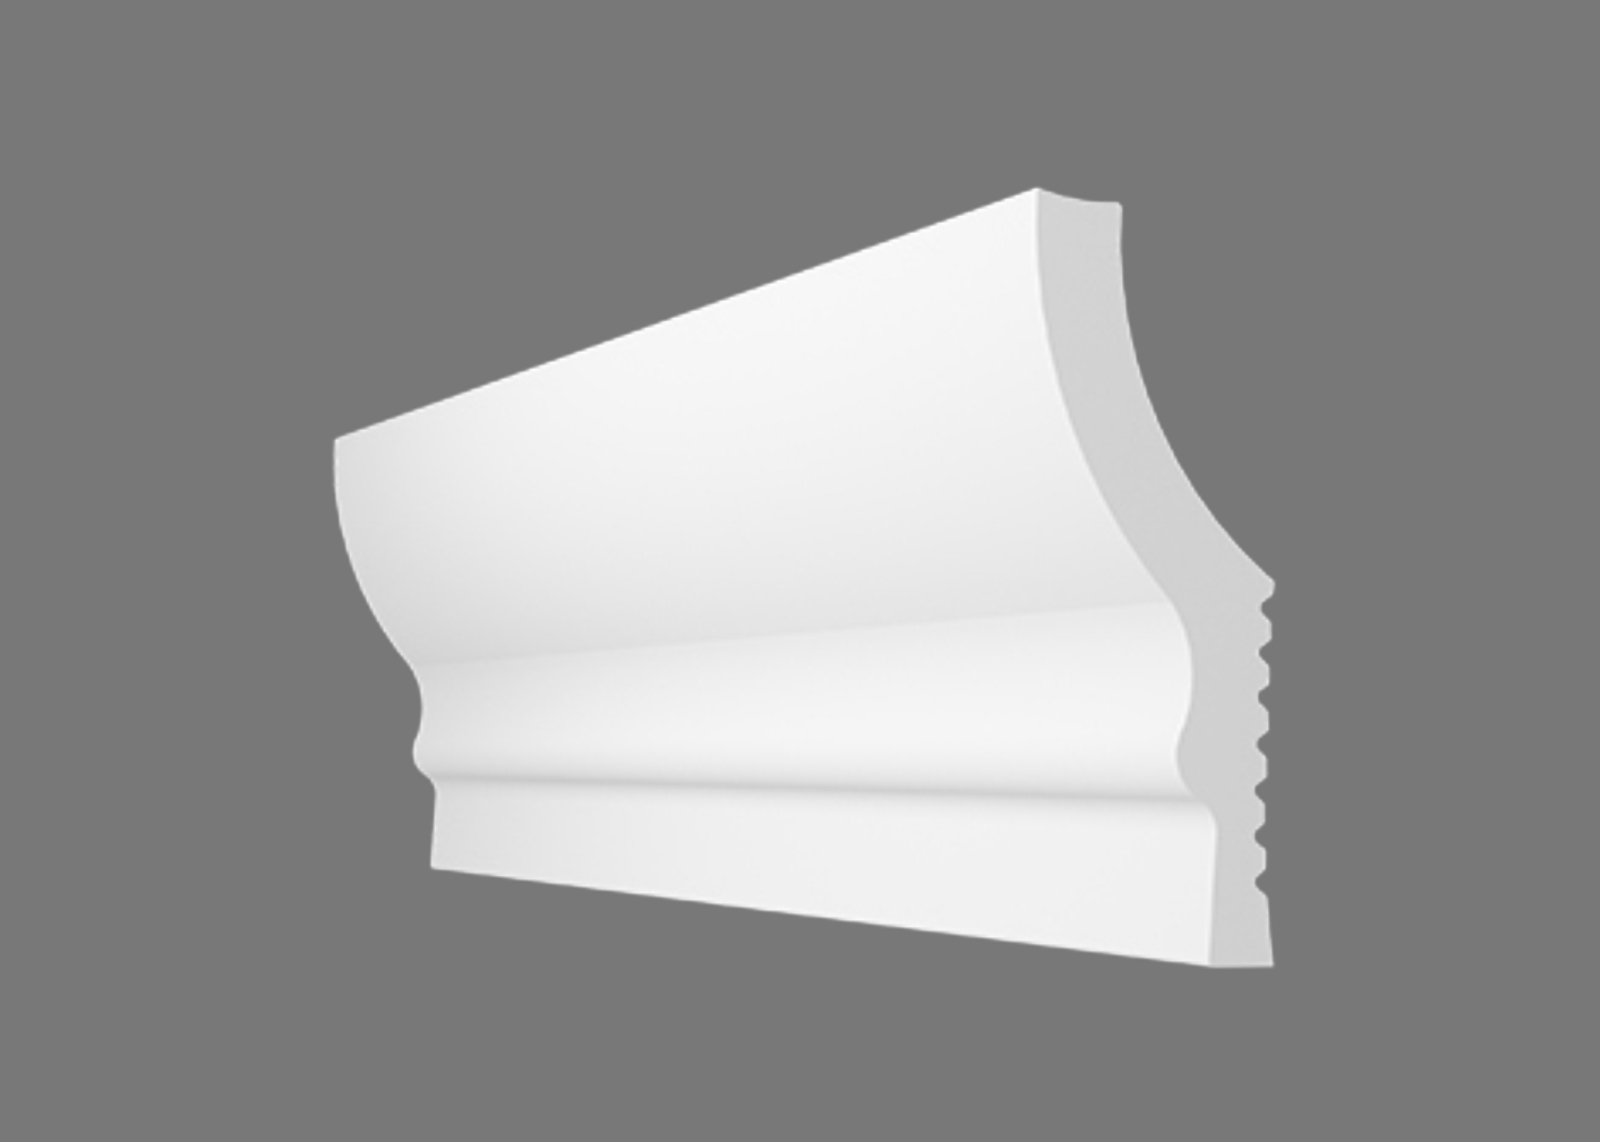 Потолочный плинтус N-60 (Размер:18х58мм)